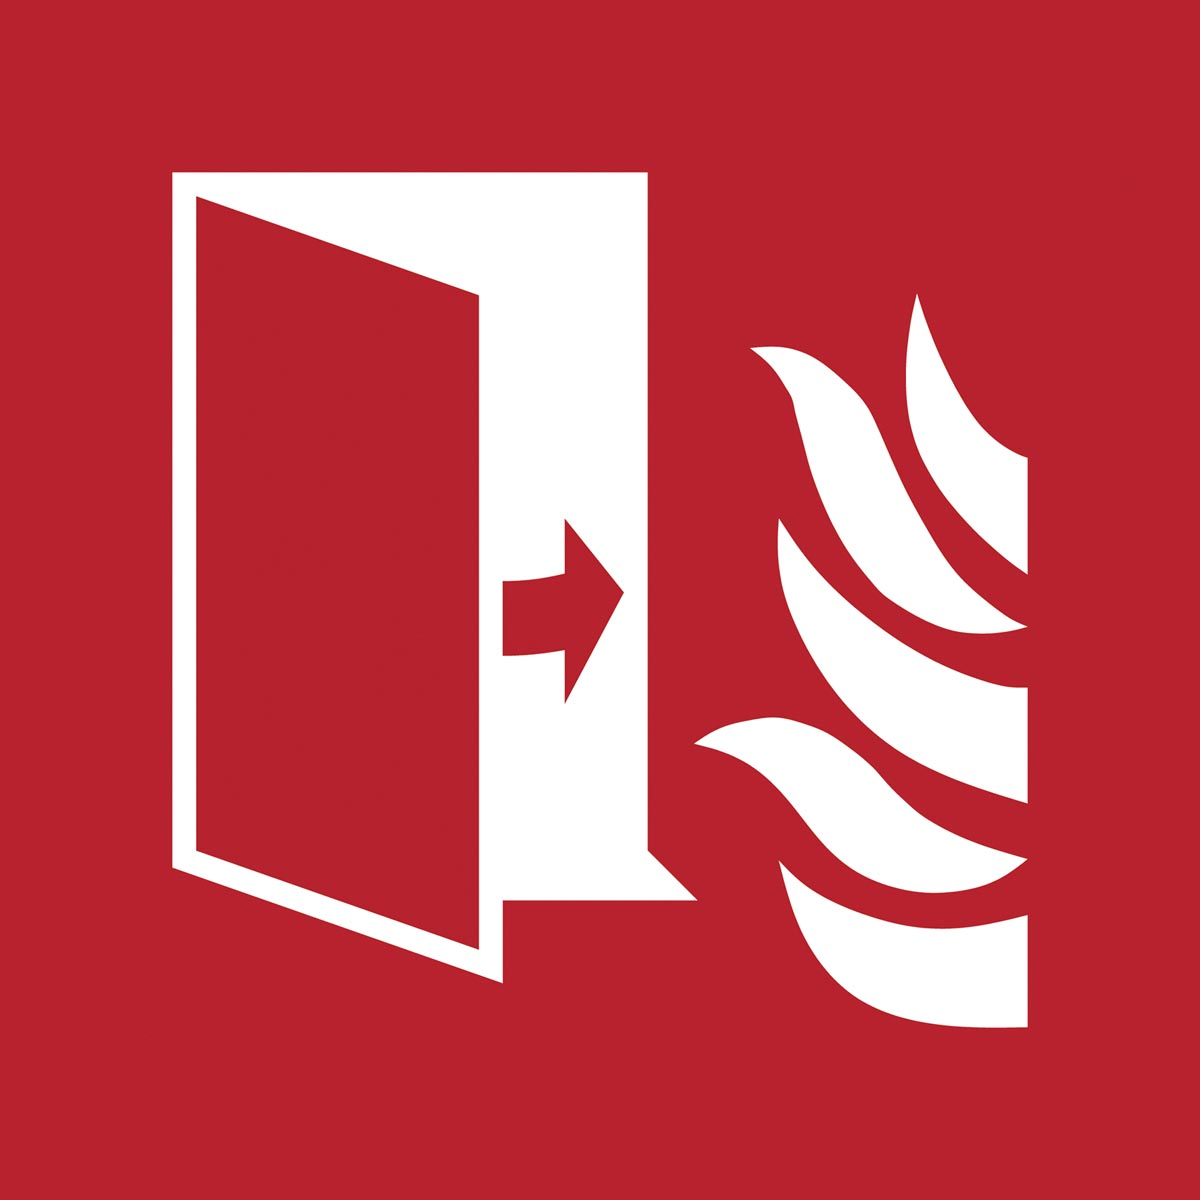 Tarifold brandveiligheidsbord uit PP, branddeur, ft 20 x 20 cm